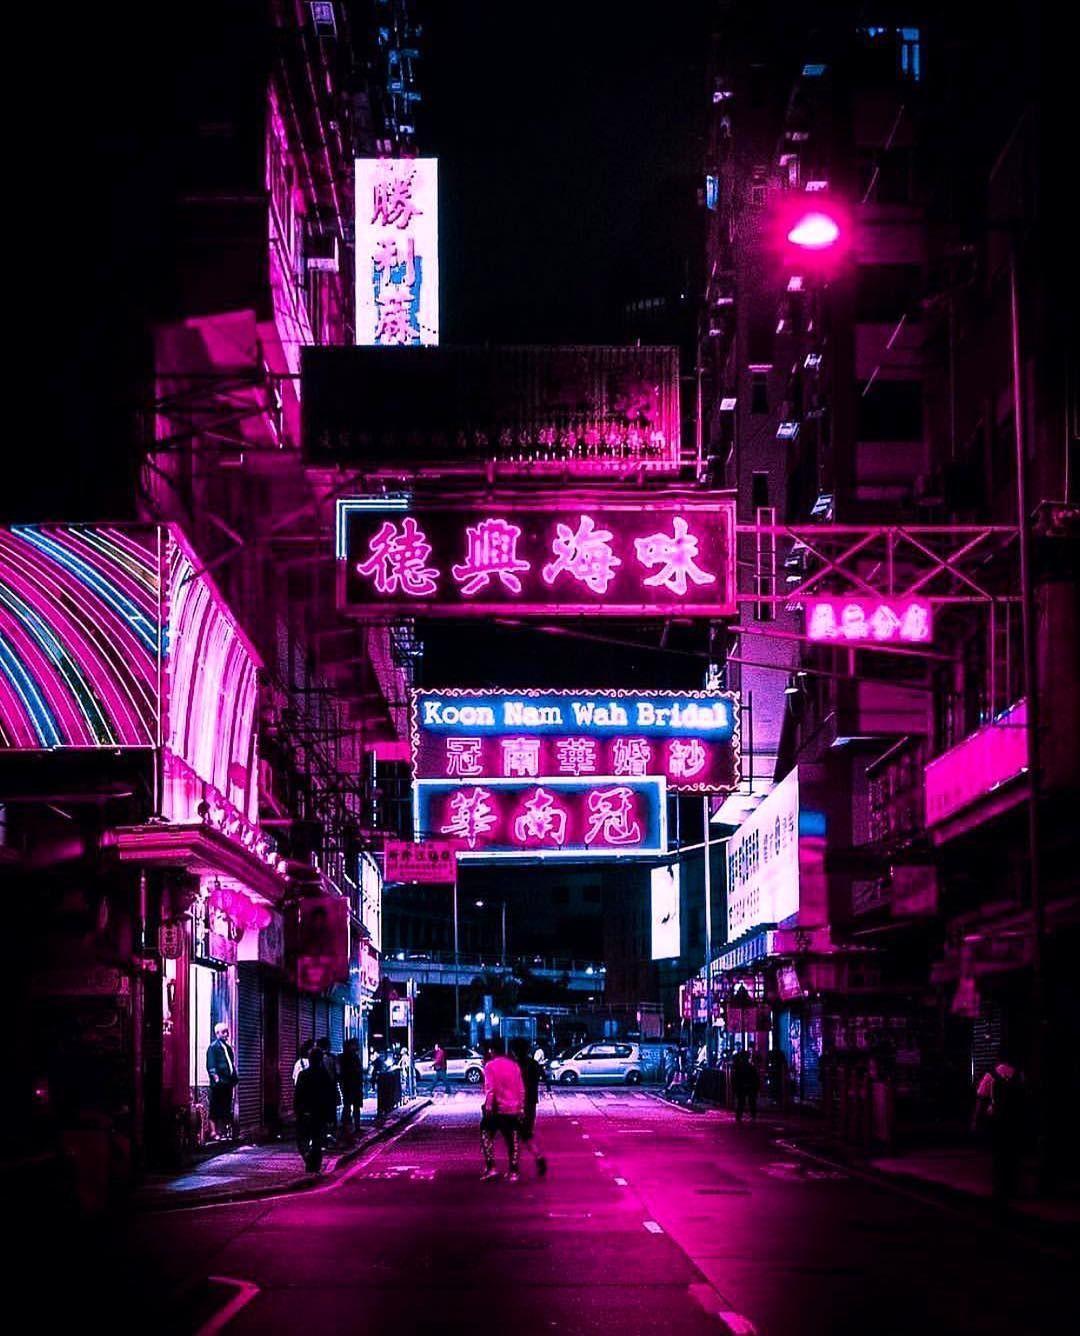 Japanese streets neon pink purple lights japanese lights